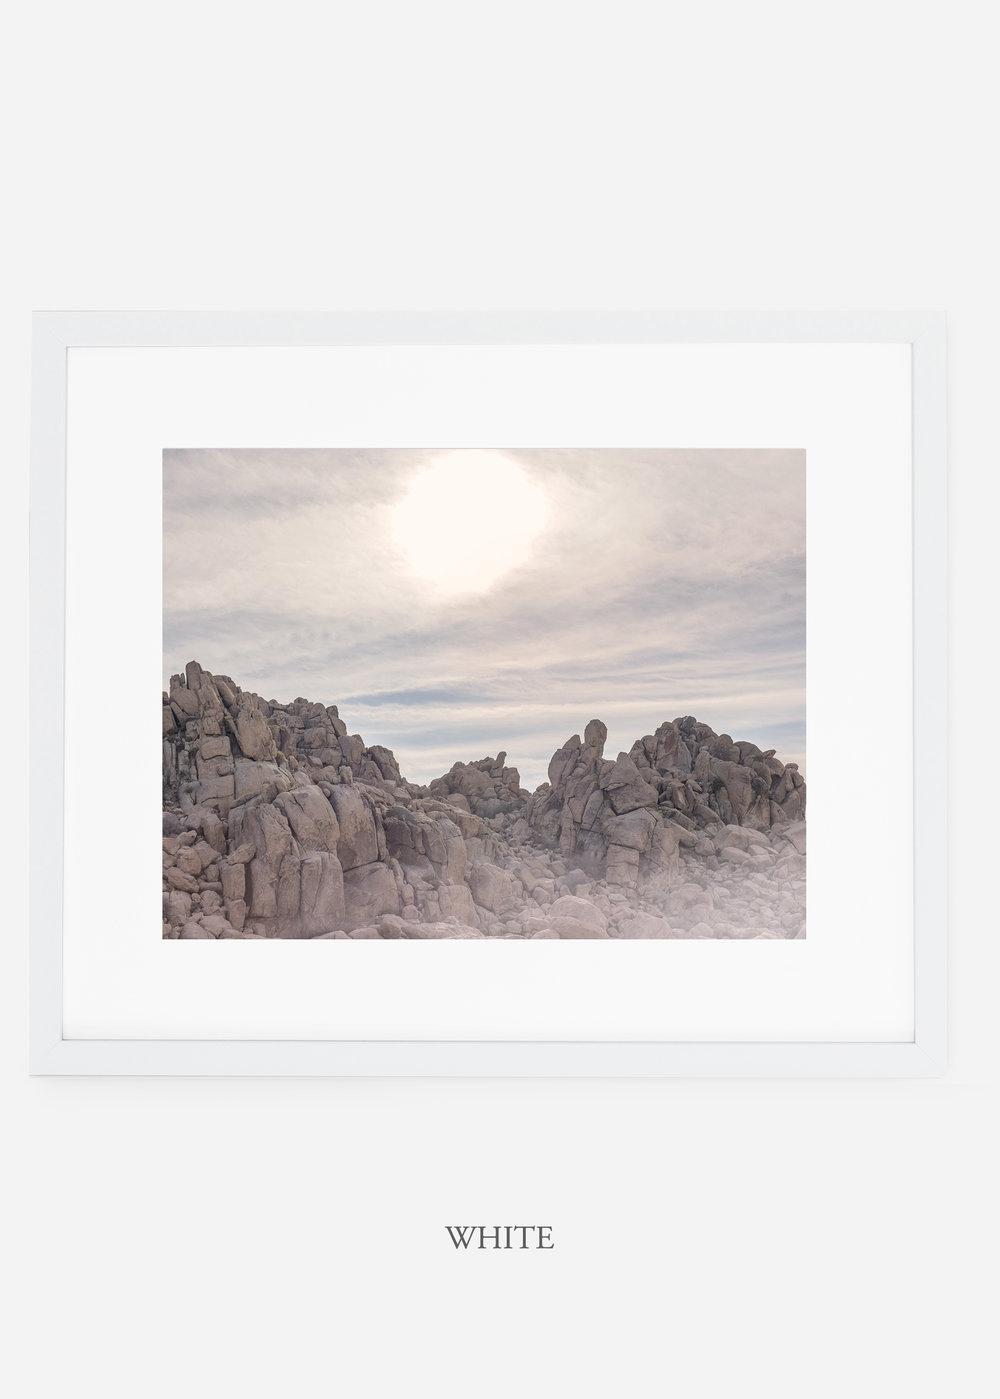 WilderCalifornia_whiteframe_JoshuaTree_Rocks_No.3_interiordesign_desert_art.jpg